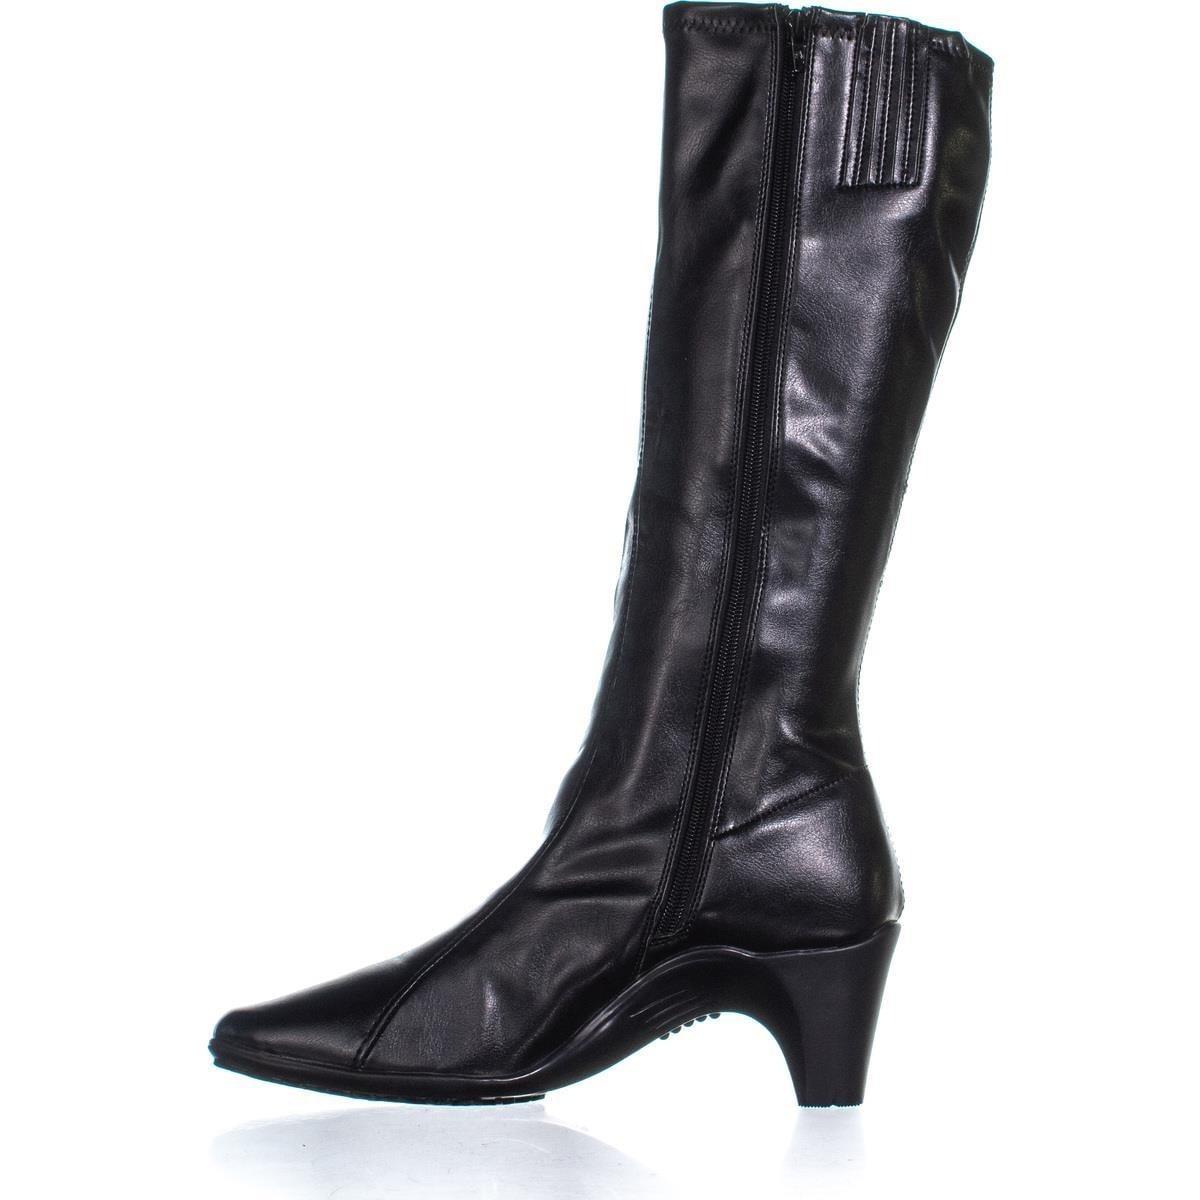 Aerosoles Lasticity Stretch Tall Boots